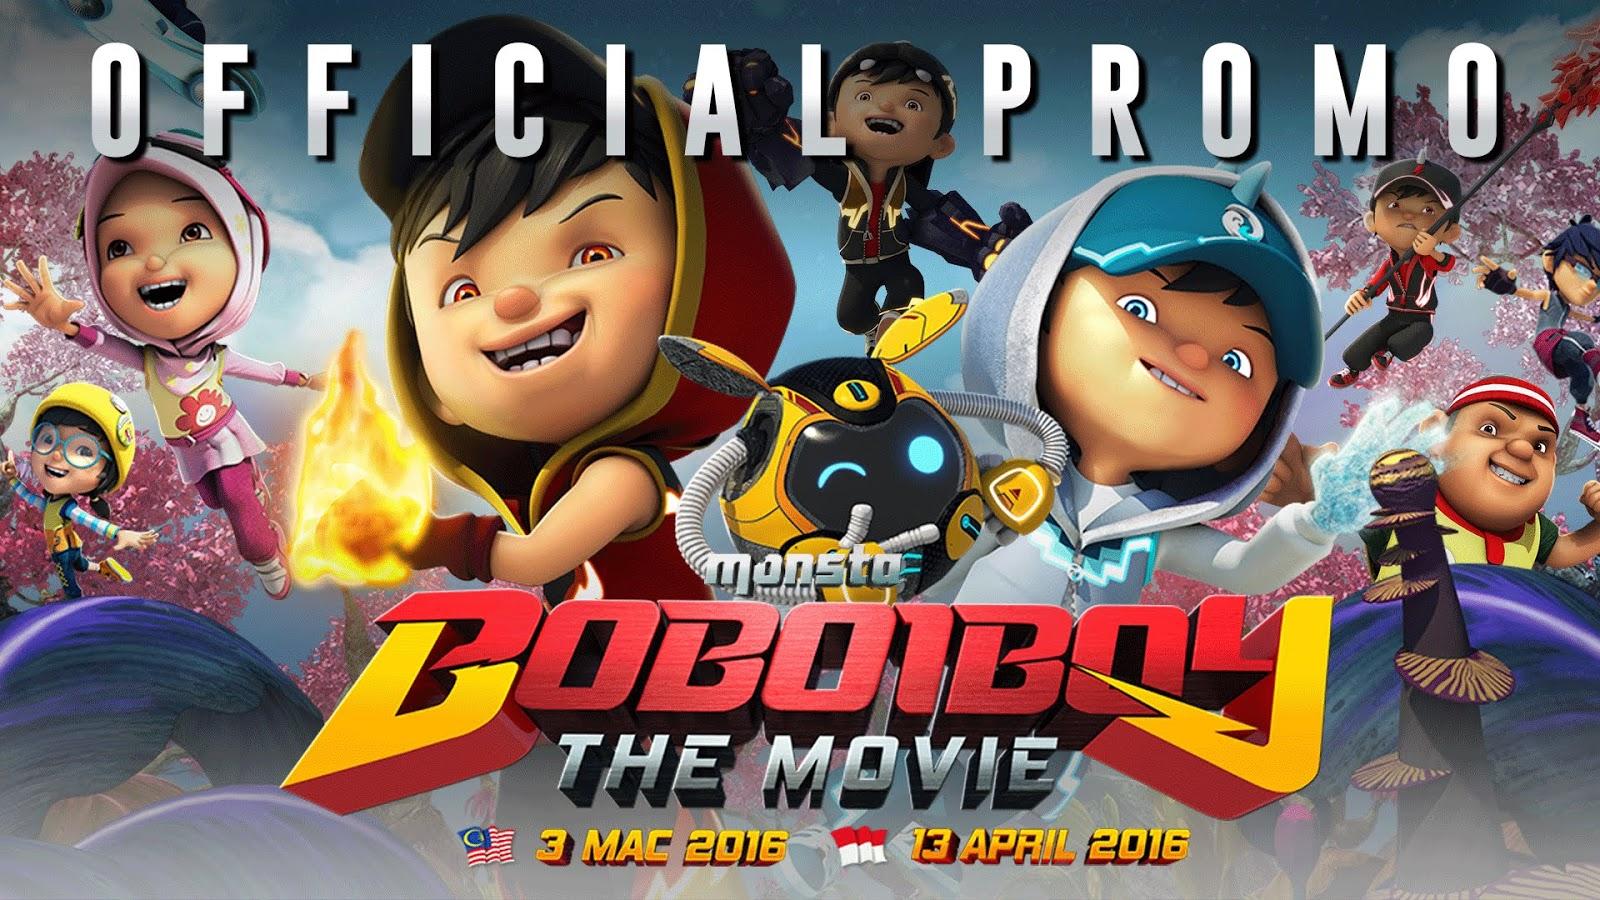 Download Film Boboiboy The Movie 2016 Download Film Terbaru